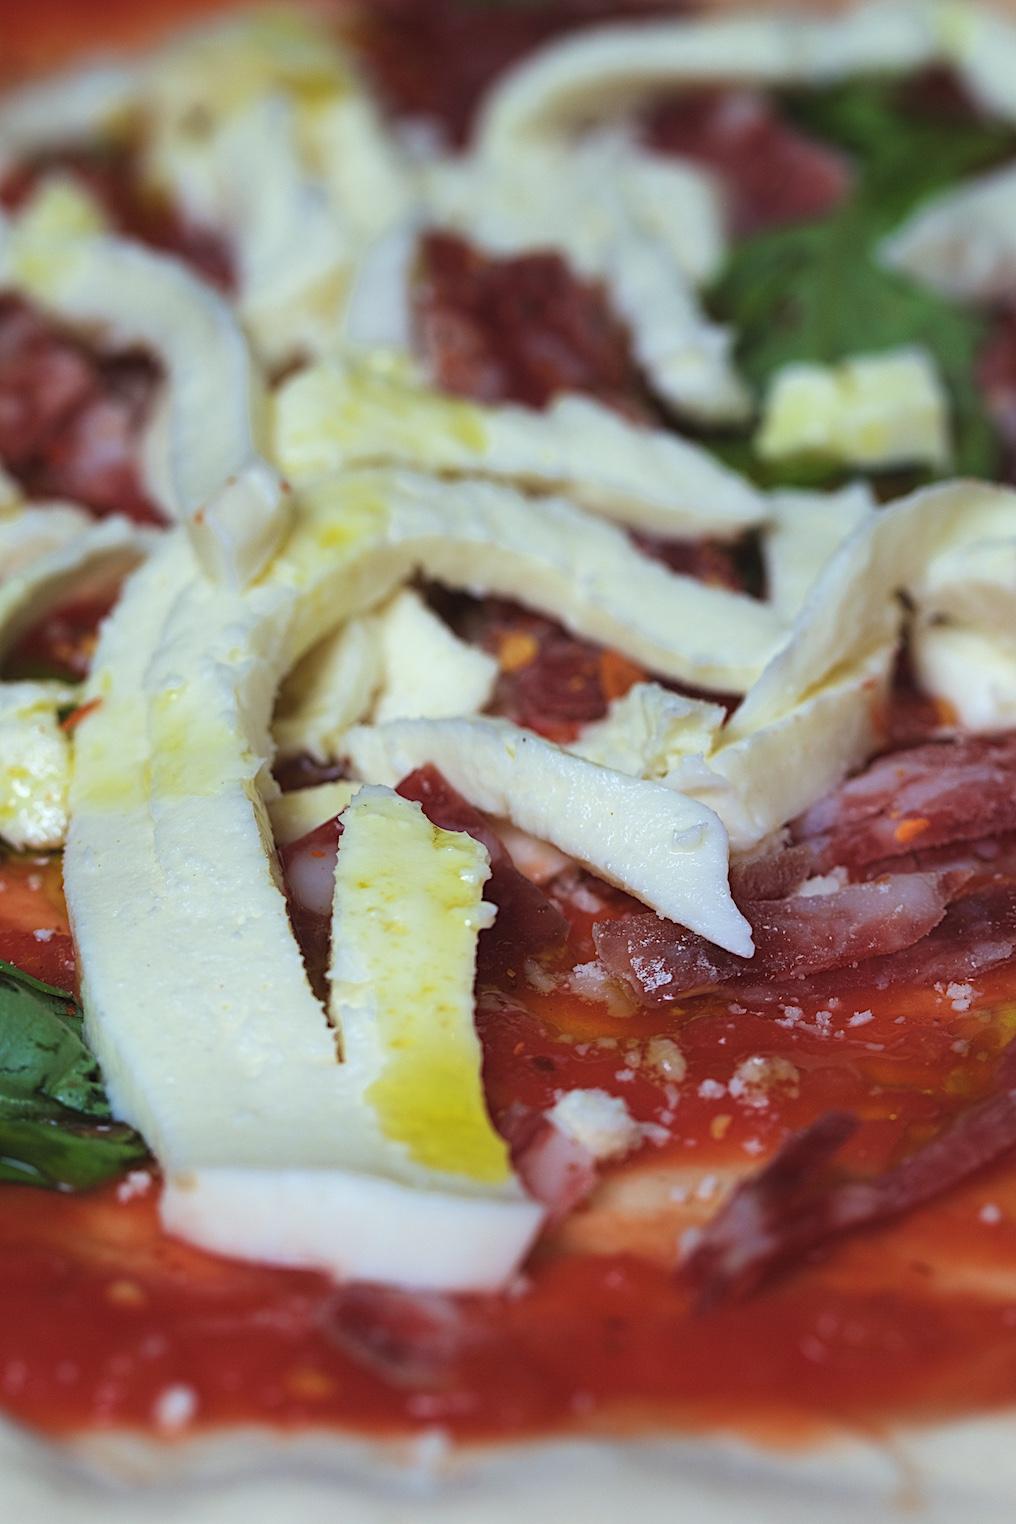 009-Pizzazzà-Nologo_IMG_9150